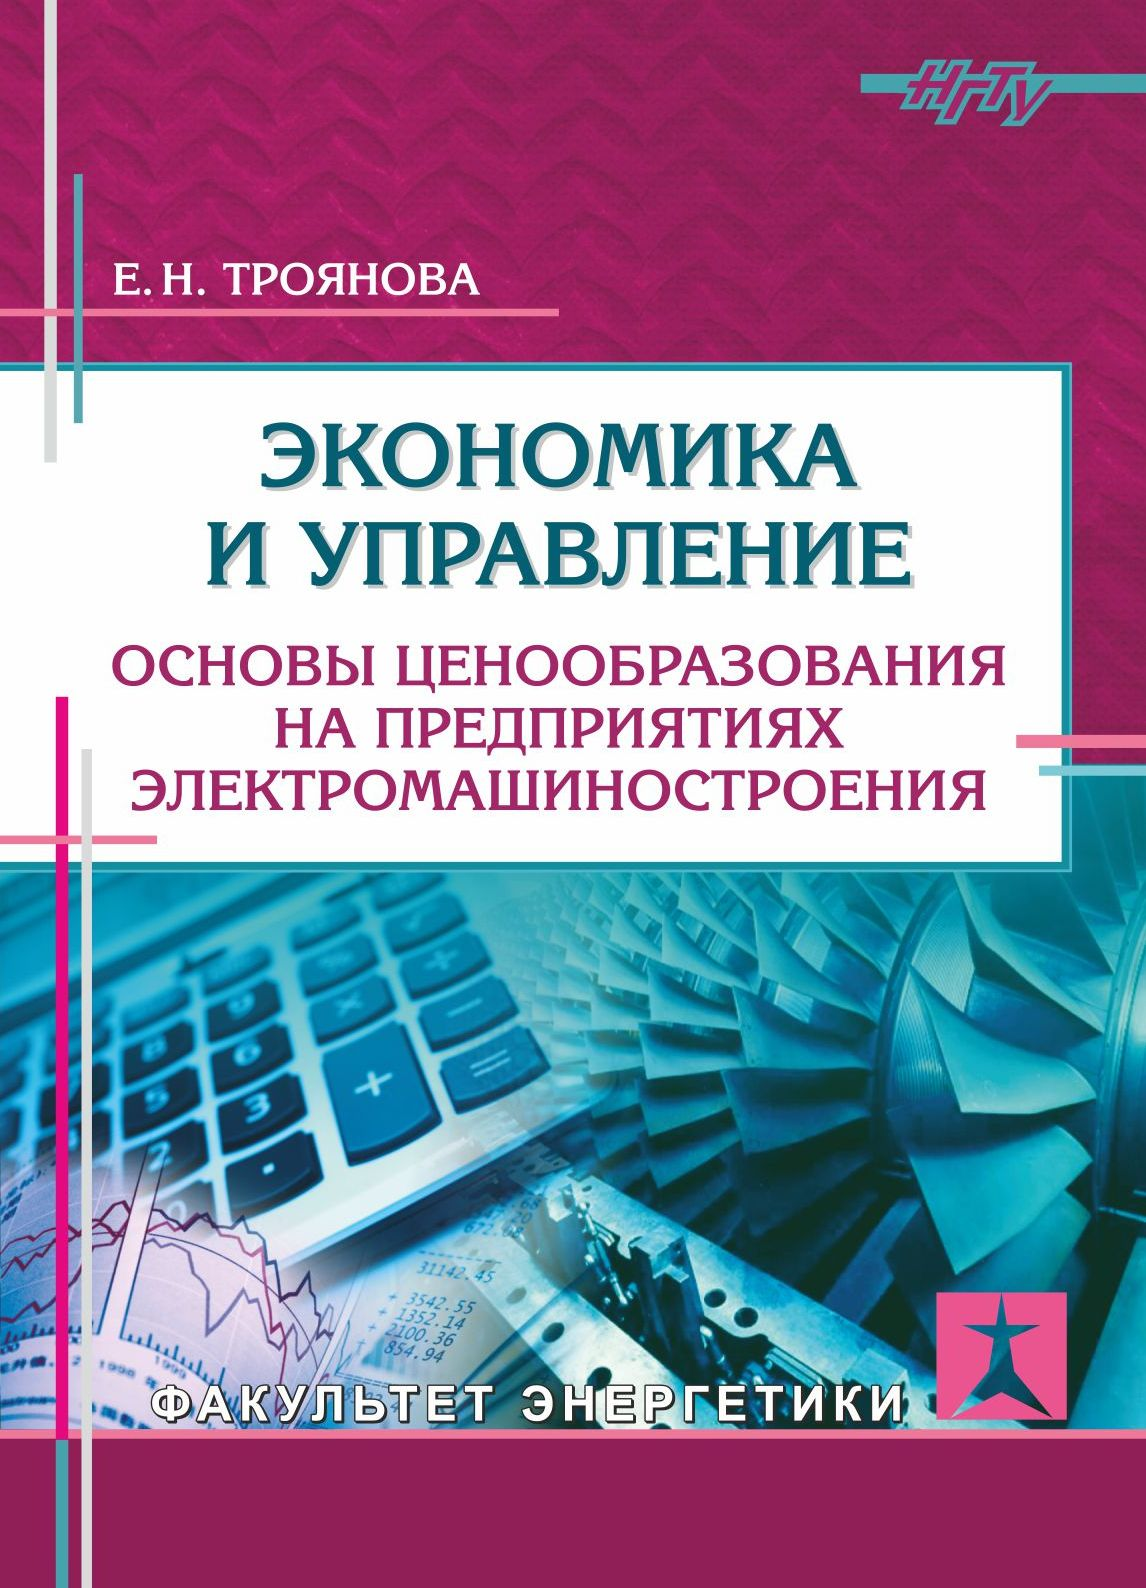 Е. Н. Троянова Экономика и управление. Основы ценообразования на предприятиях электромашиностроения